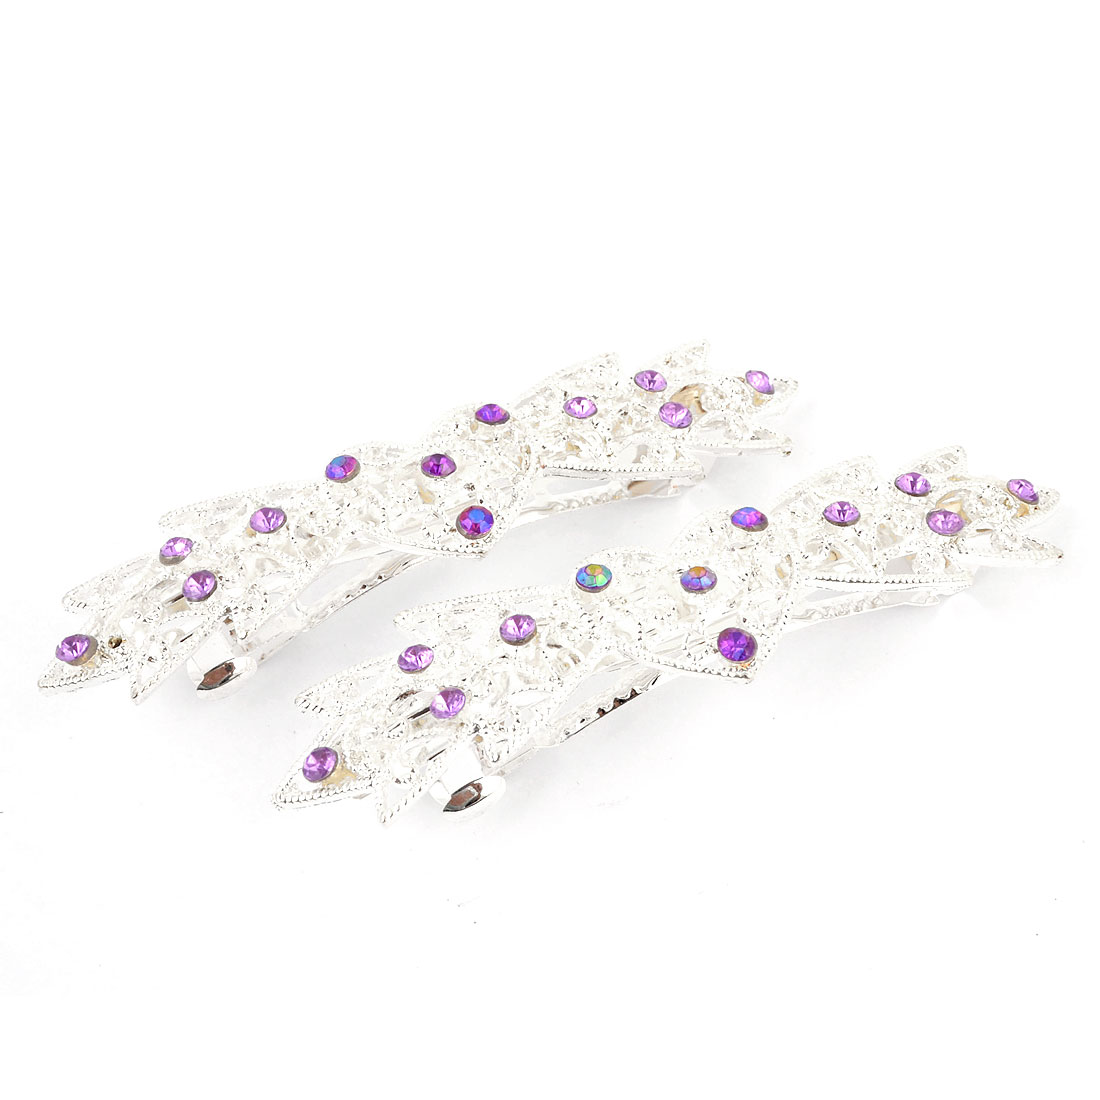 Lady Purple Rhinestone Decor Silver Tone Metal French Clip Hair Barrette 2pcs